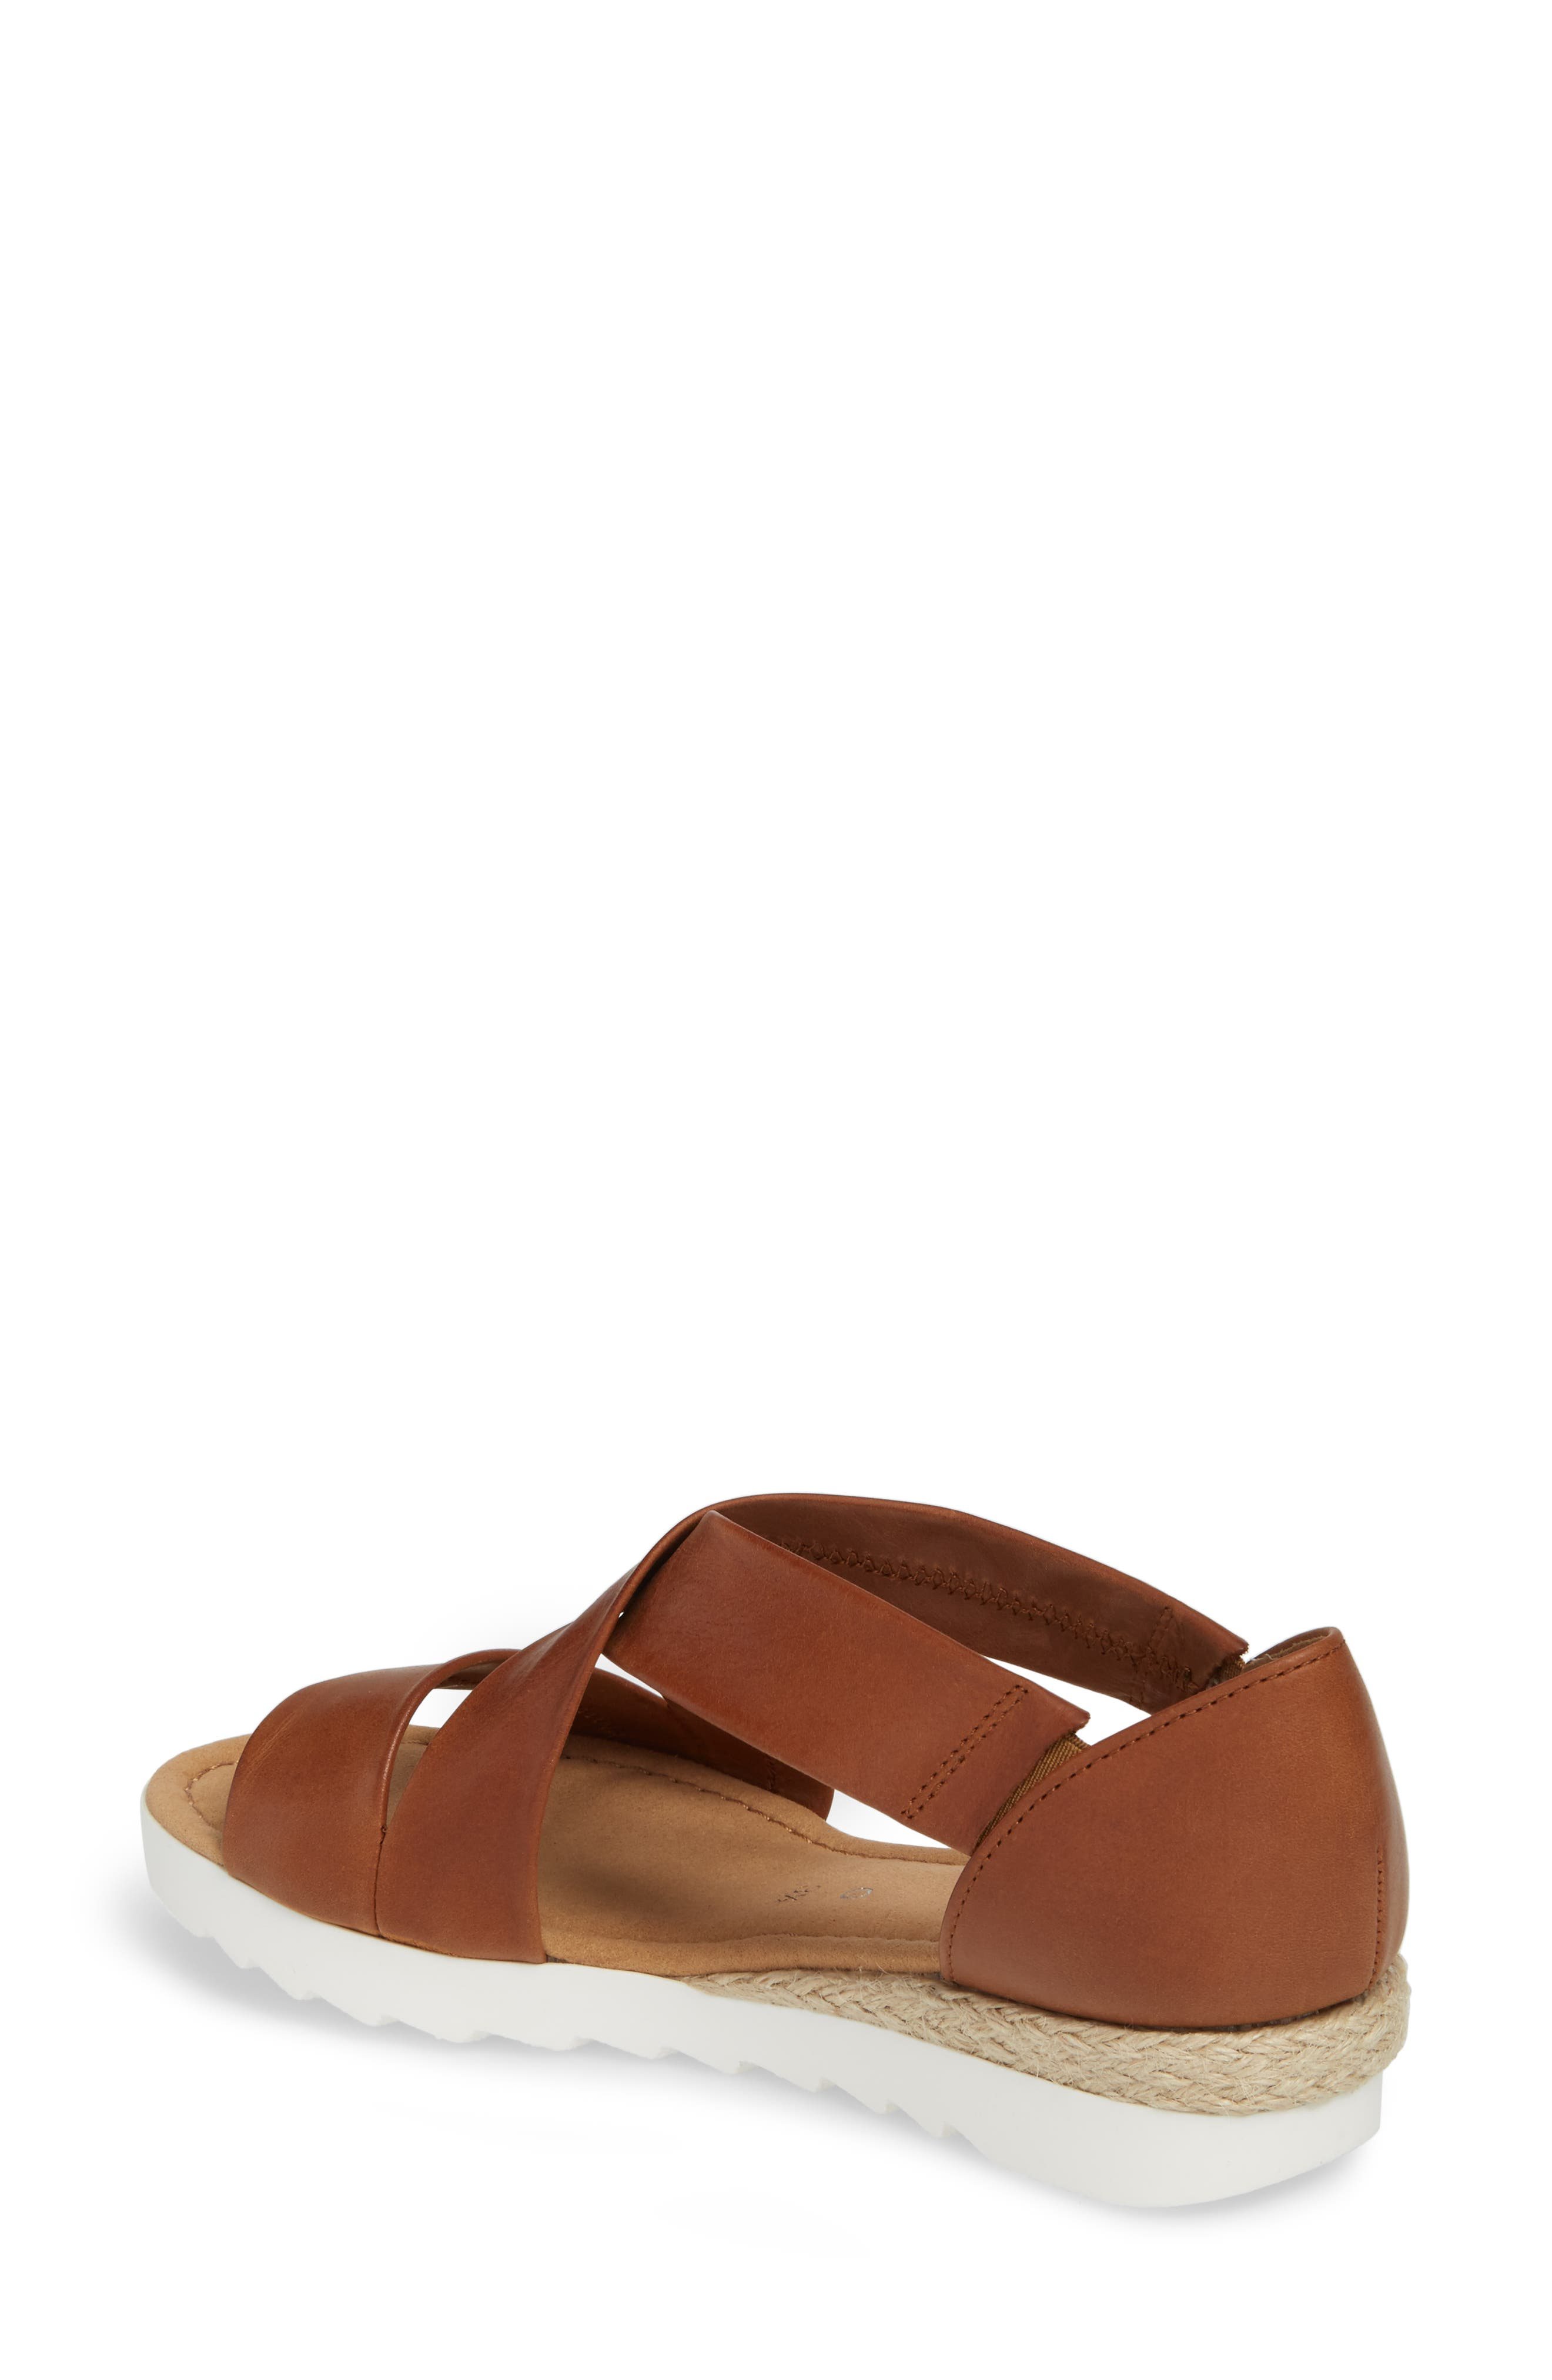 Cross Strap Sandal,                             Alternate thumbnail 2, color,                             Brown Leather